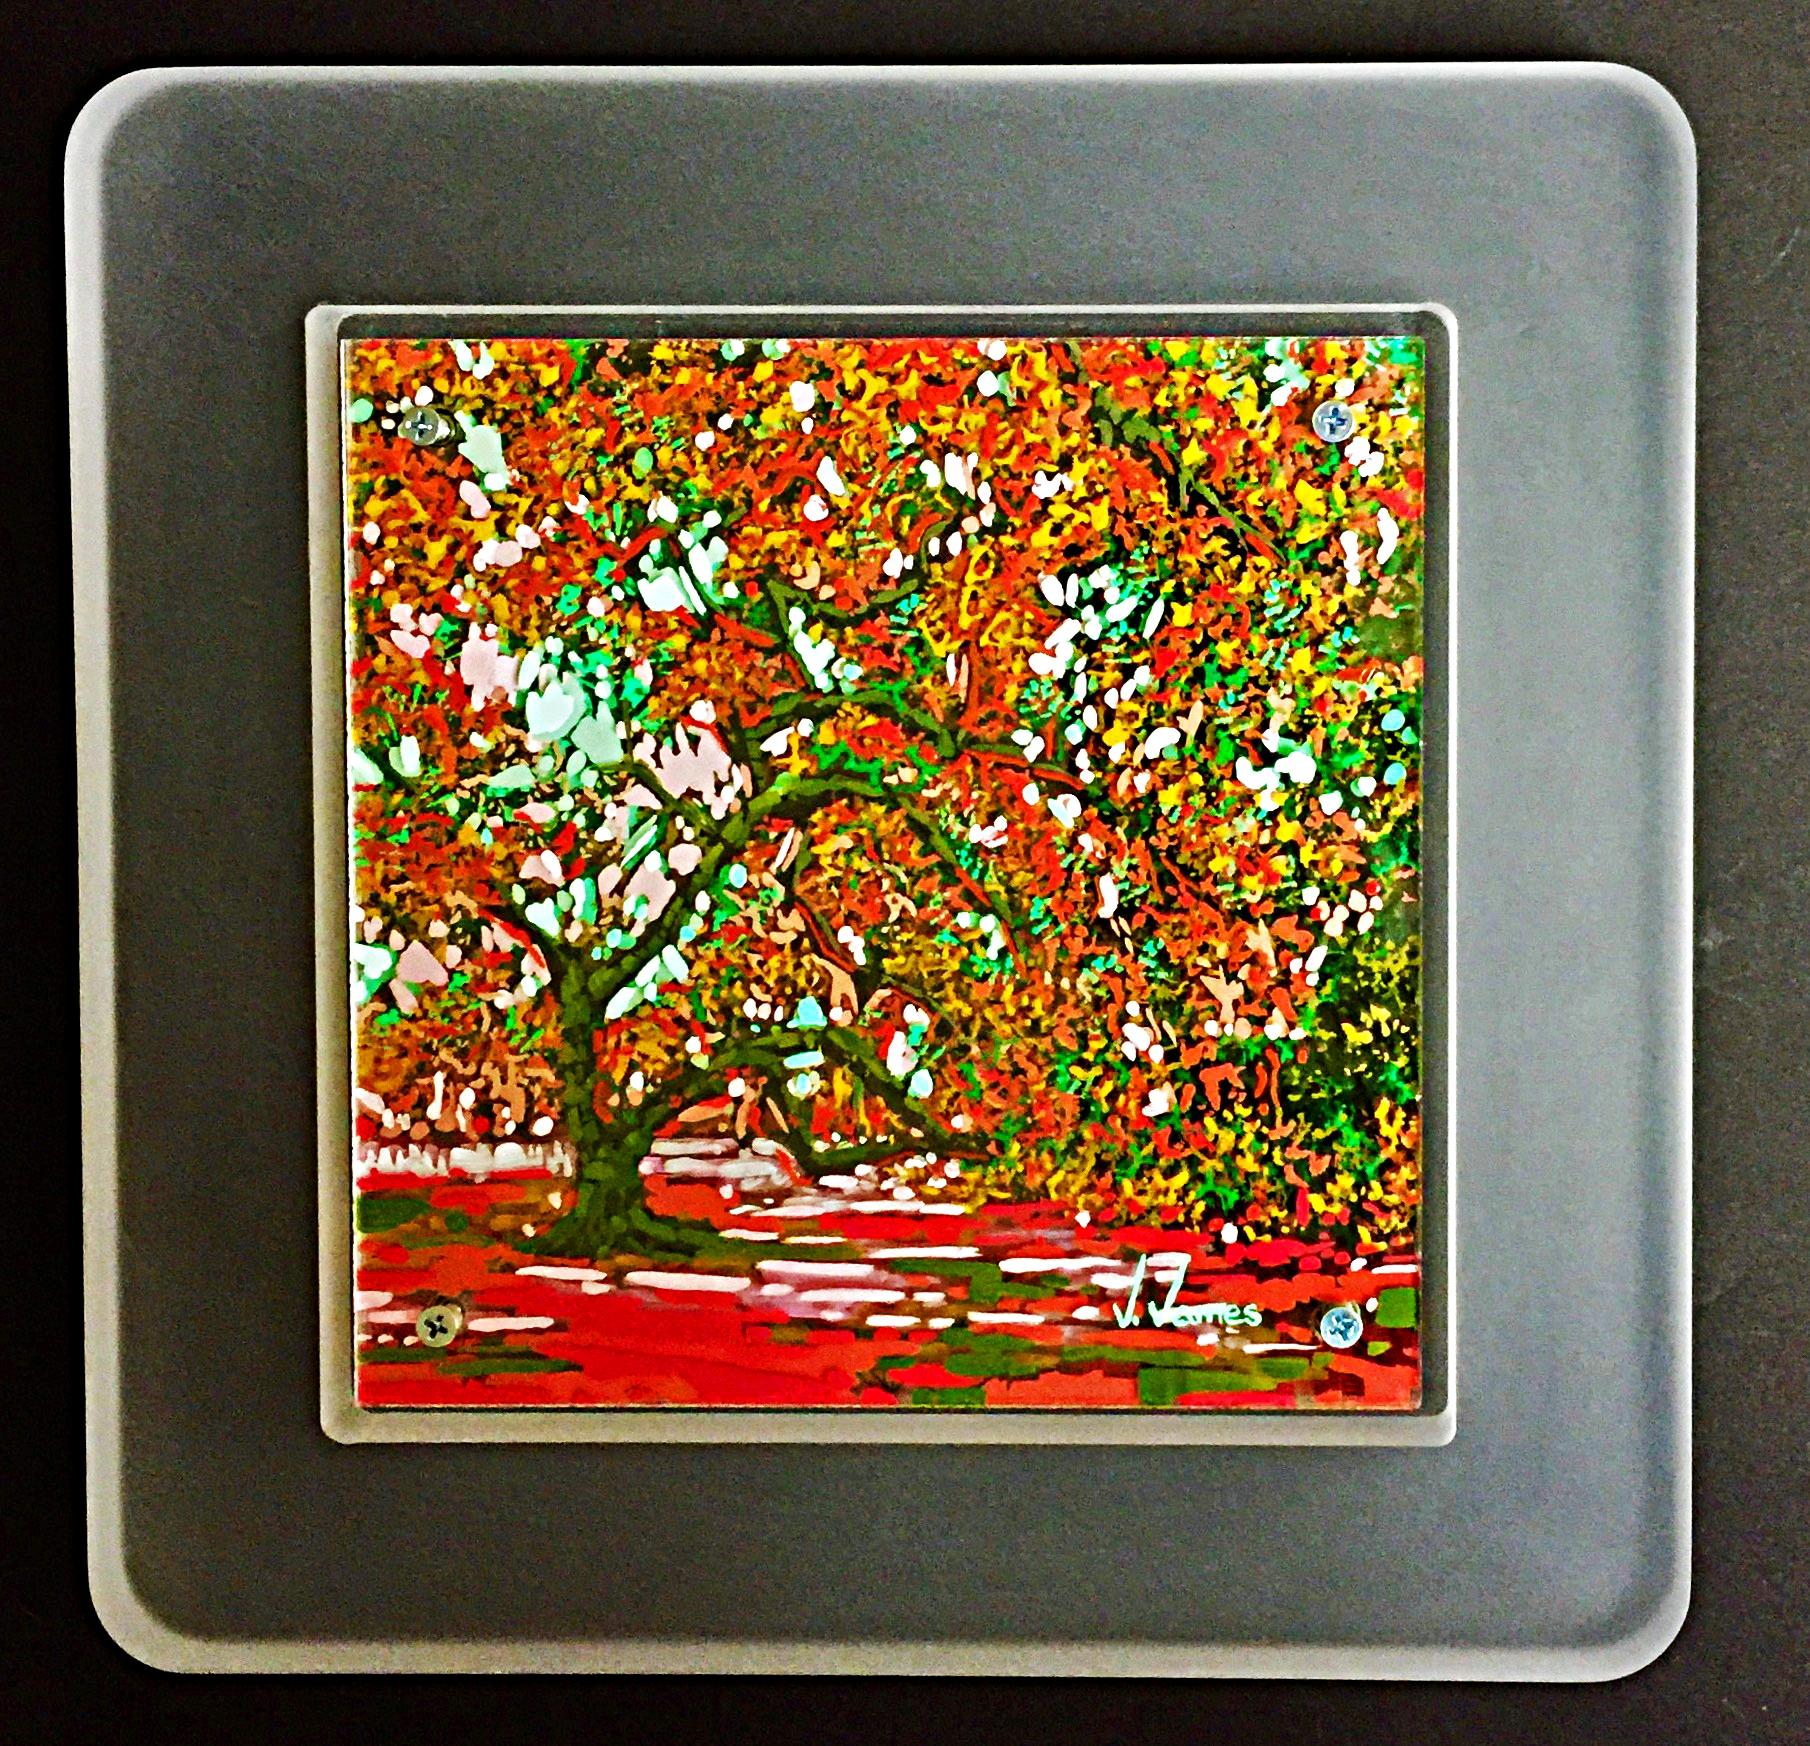 "Reverie, 8"" x 8"" Acrylic on Multi-Layered Acrylic Glass"